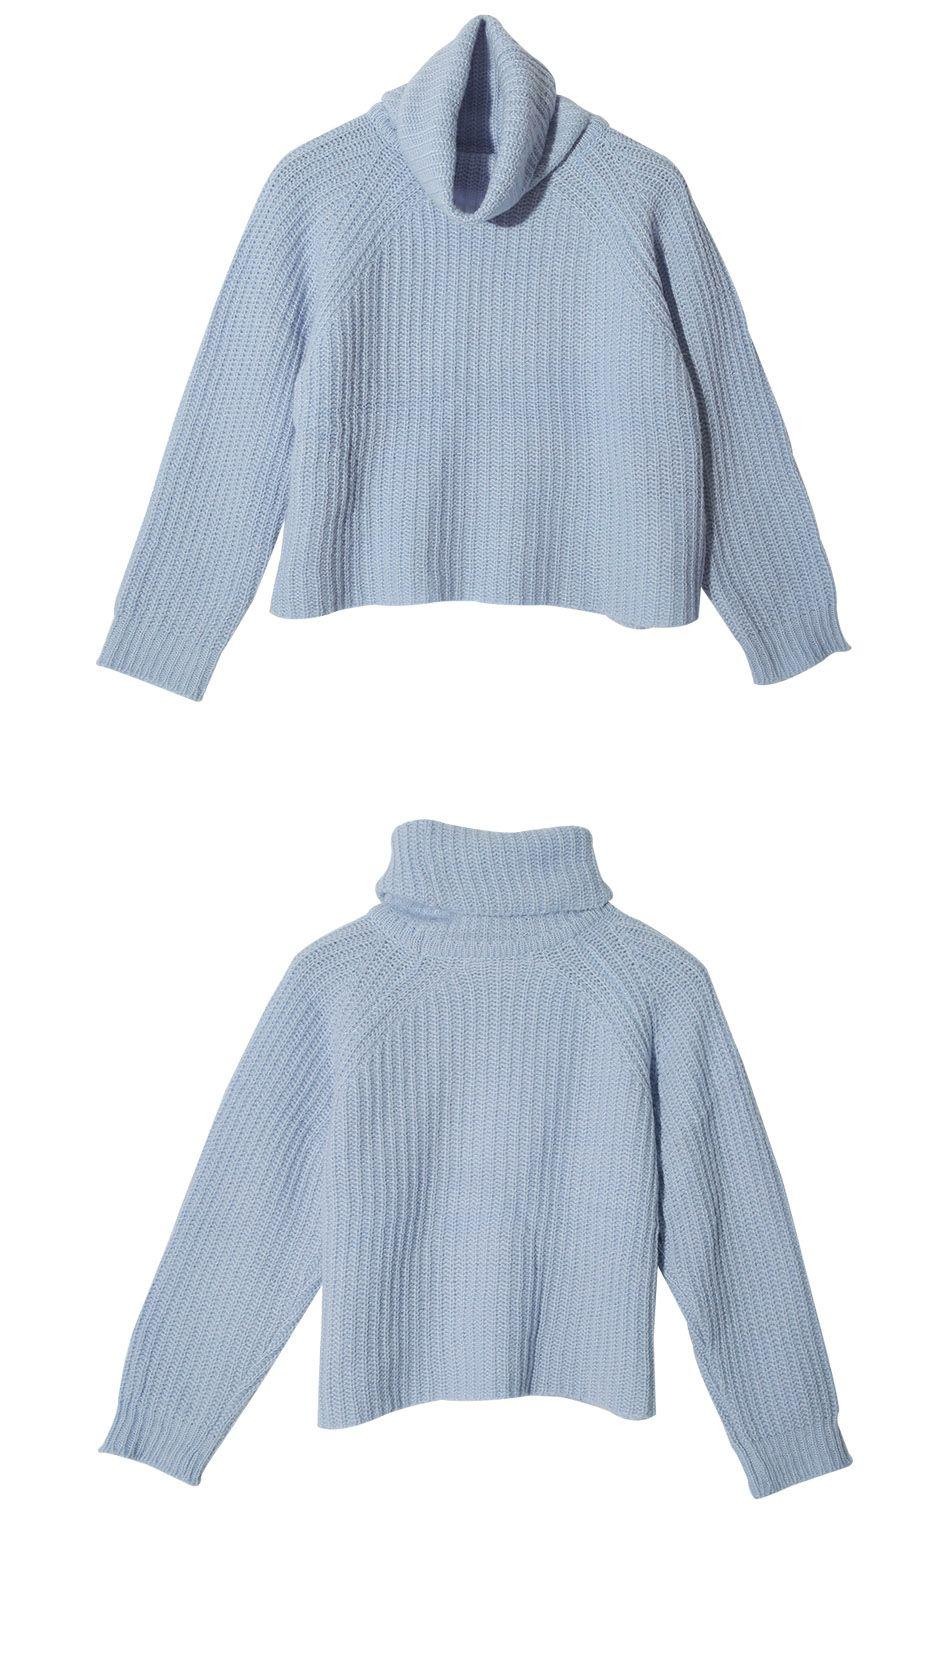 Turtleneck Raglan Knit Top (Sky Blue) | STYLENANDA